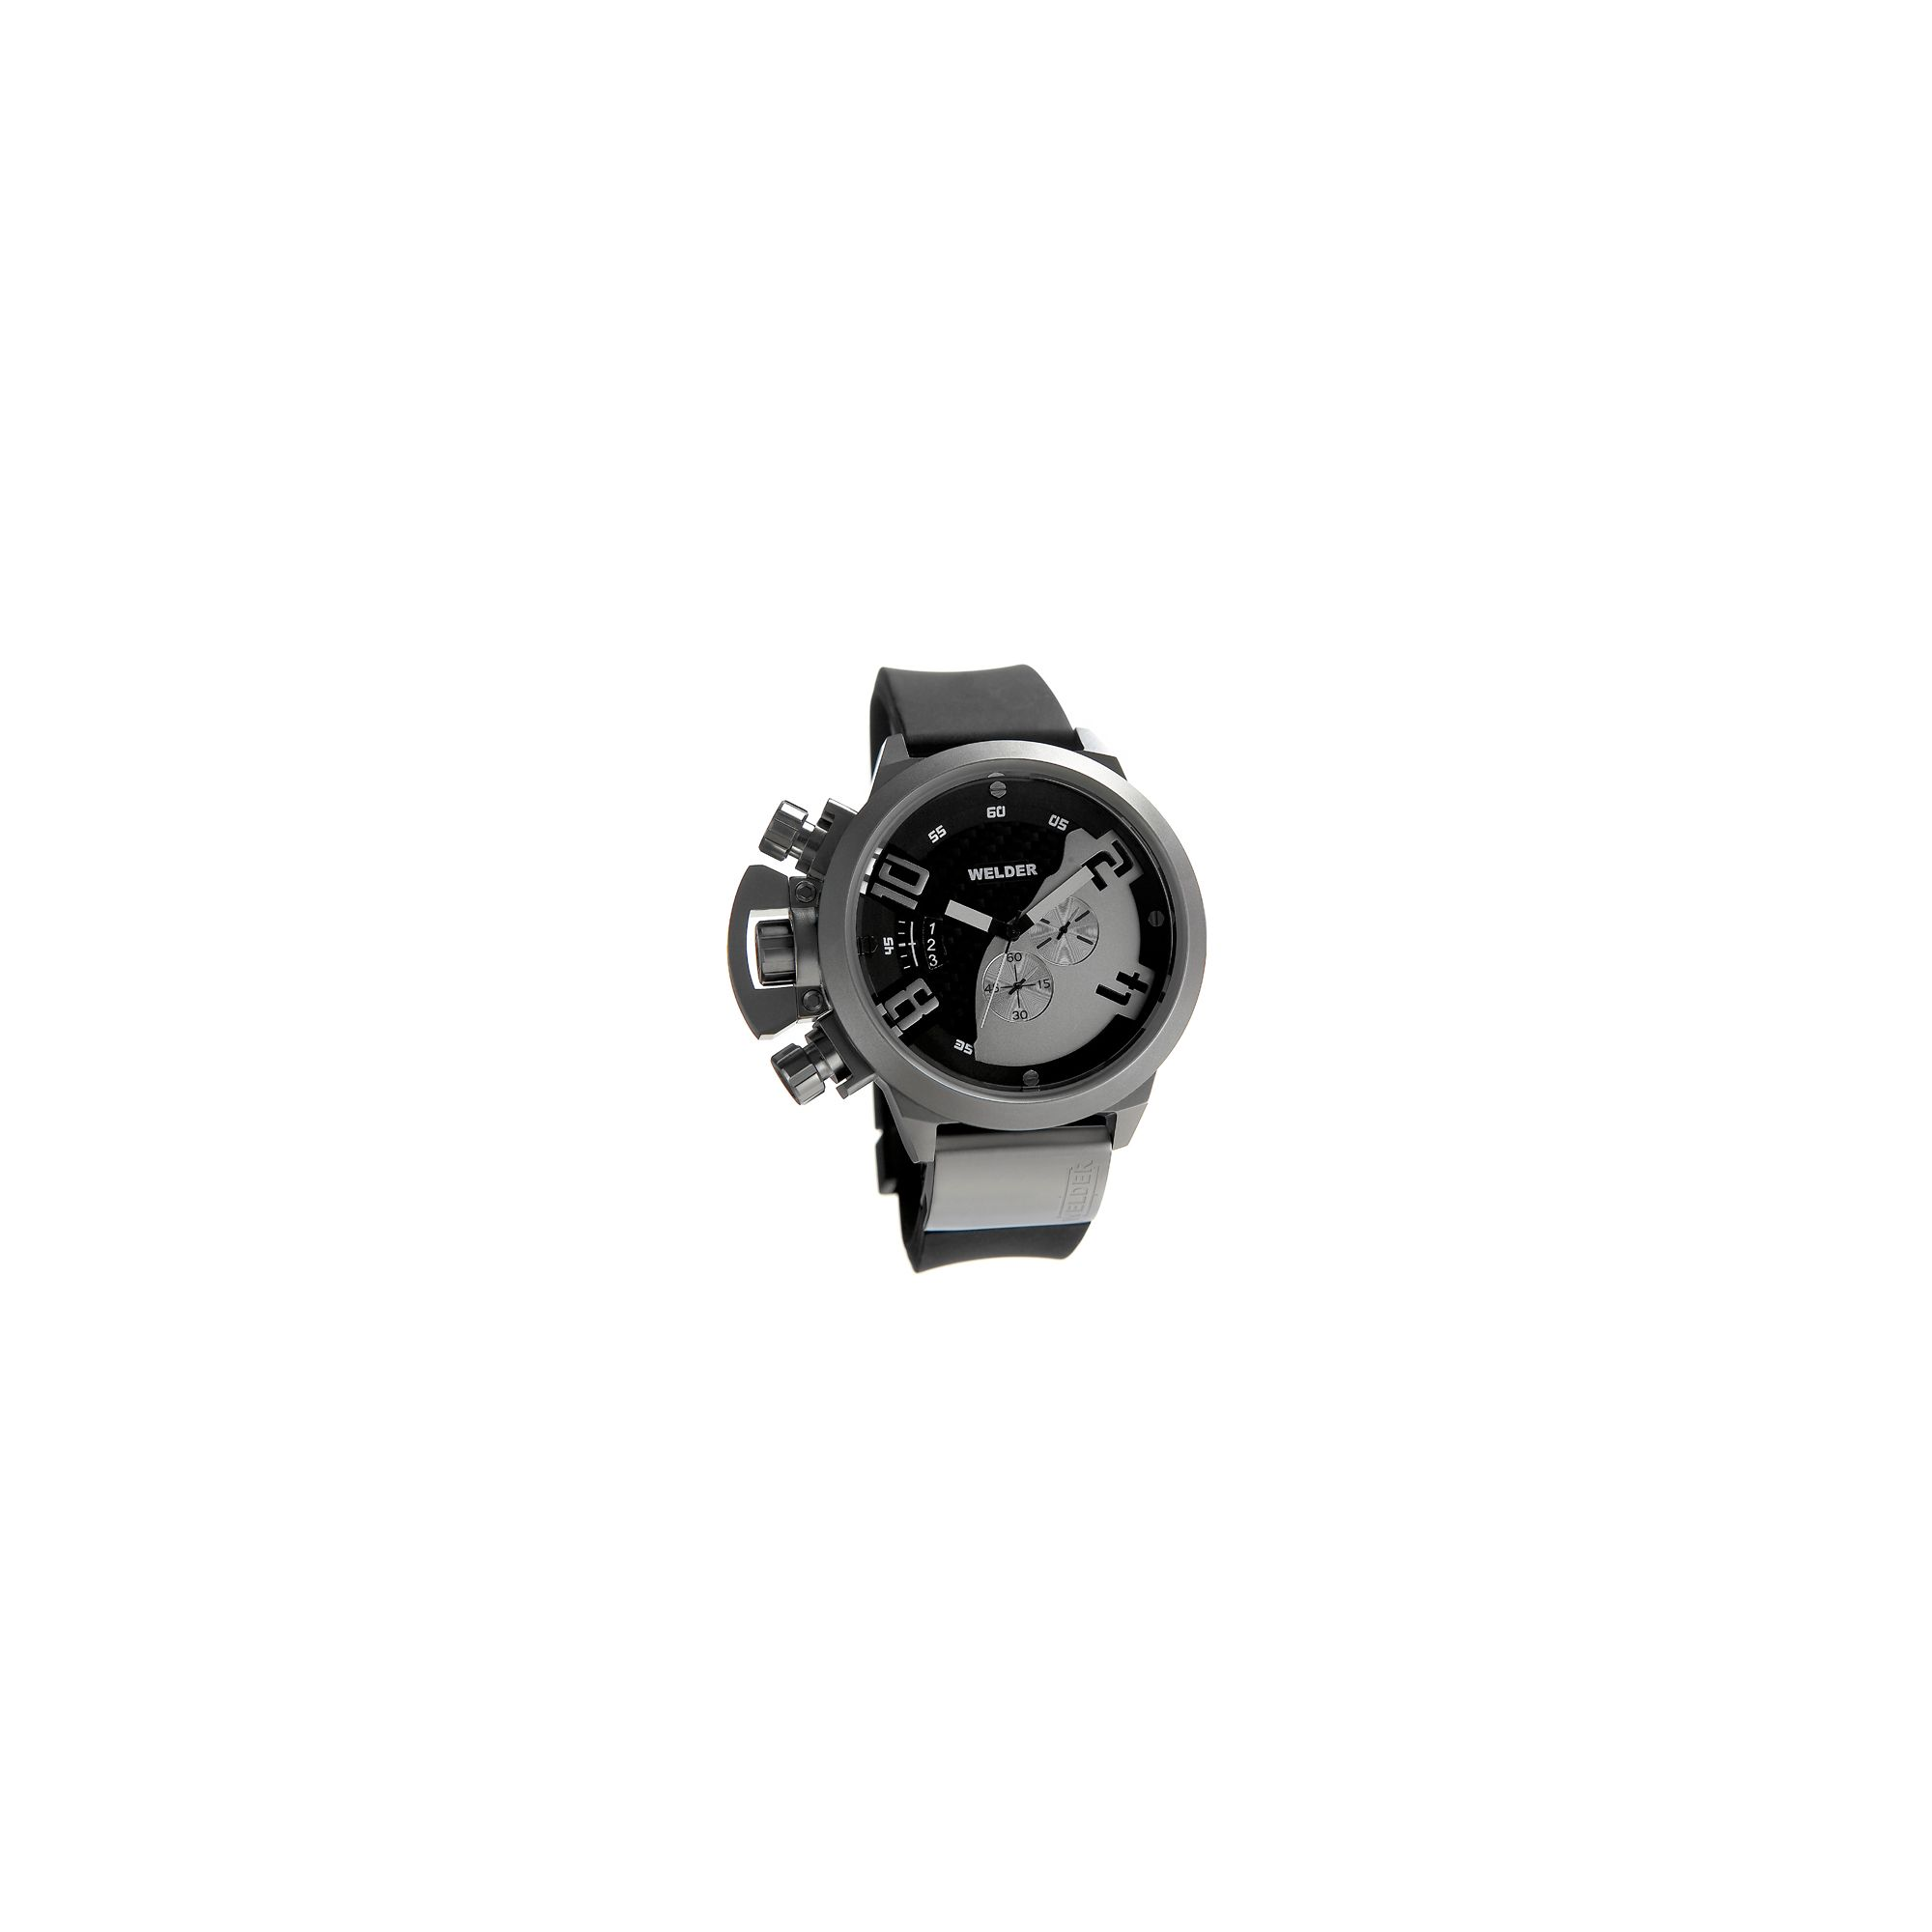 Welder Gents Black Dial Black Rubber Strap Watch K24-3205 at Tescos Direct